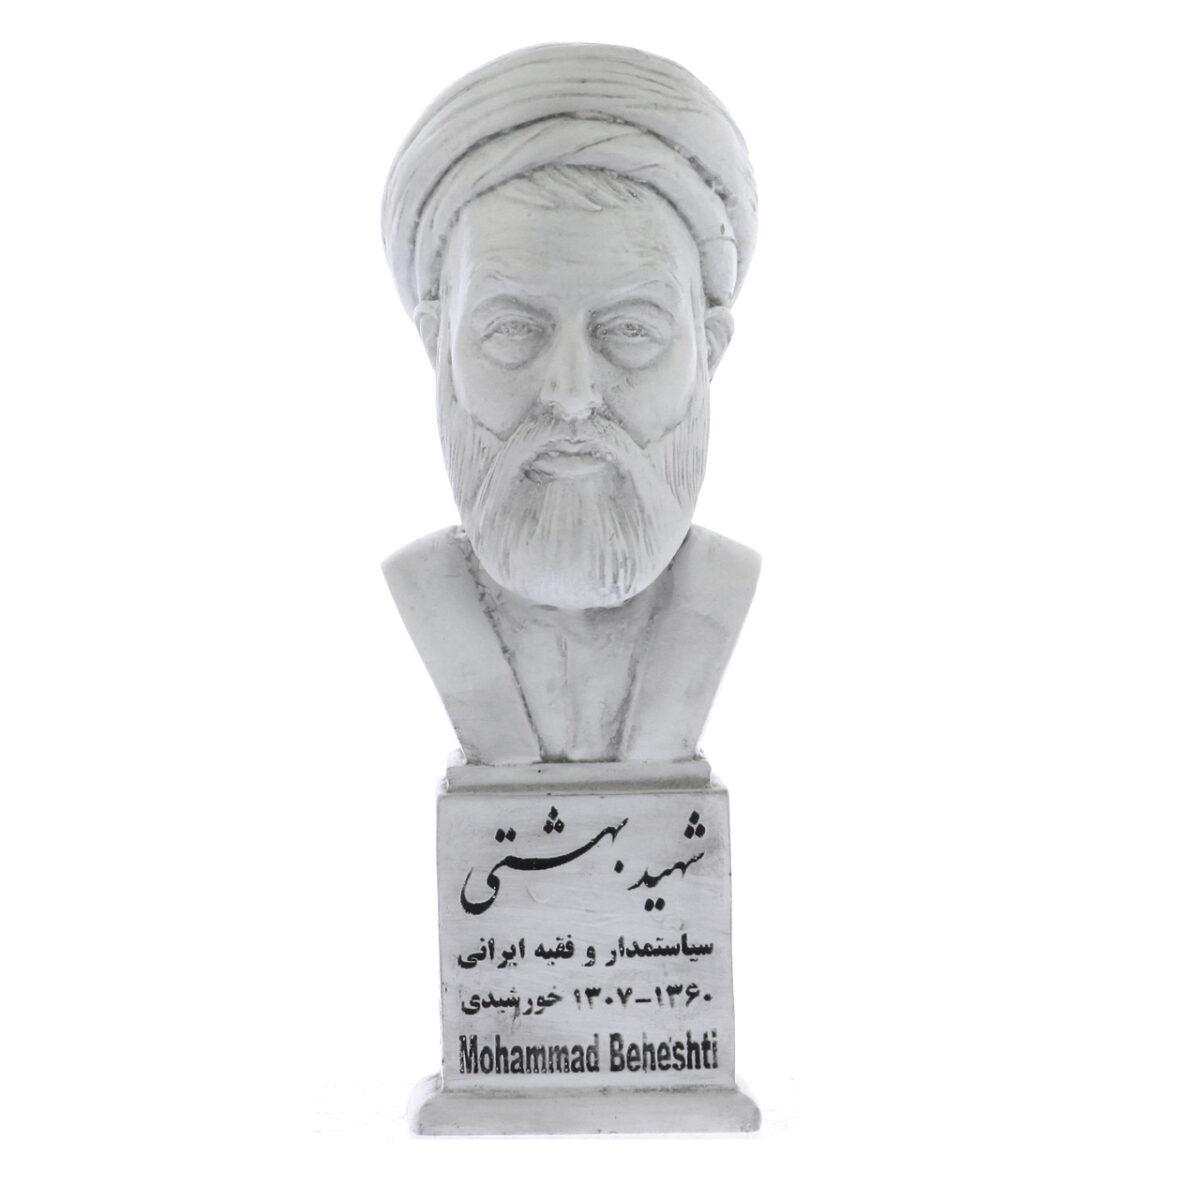 beheshti s 1200x1200 - سردیس شهید سید محمد بهشتی